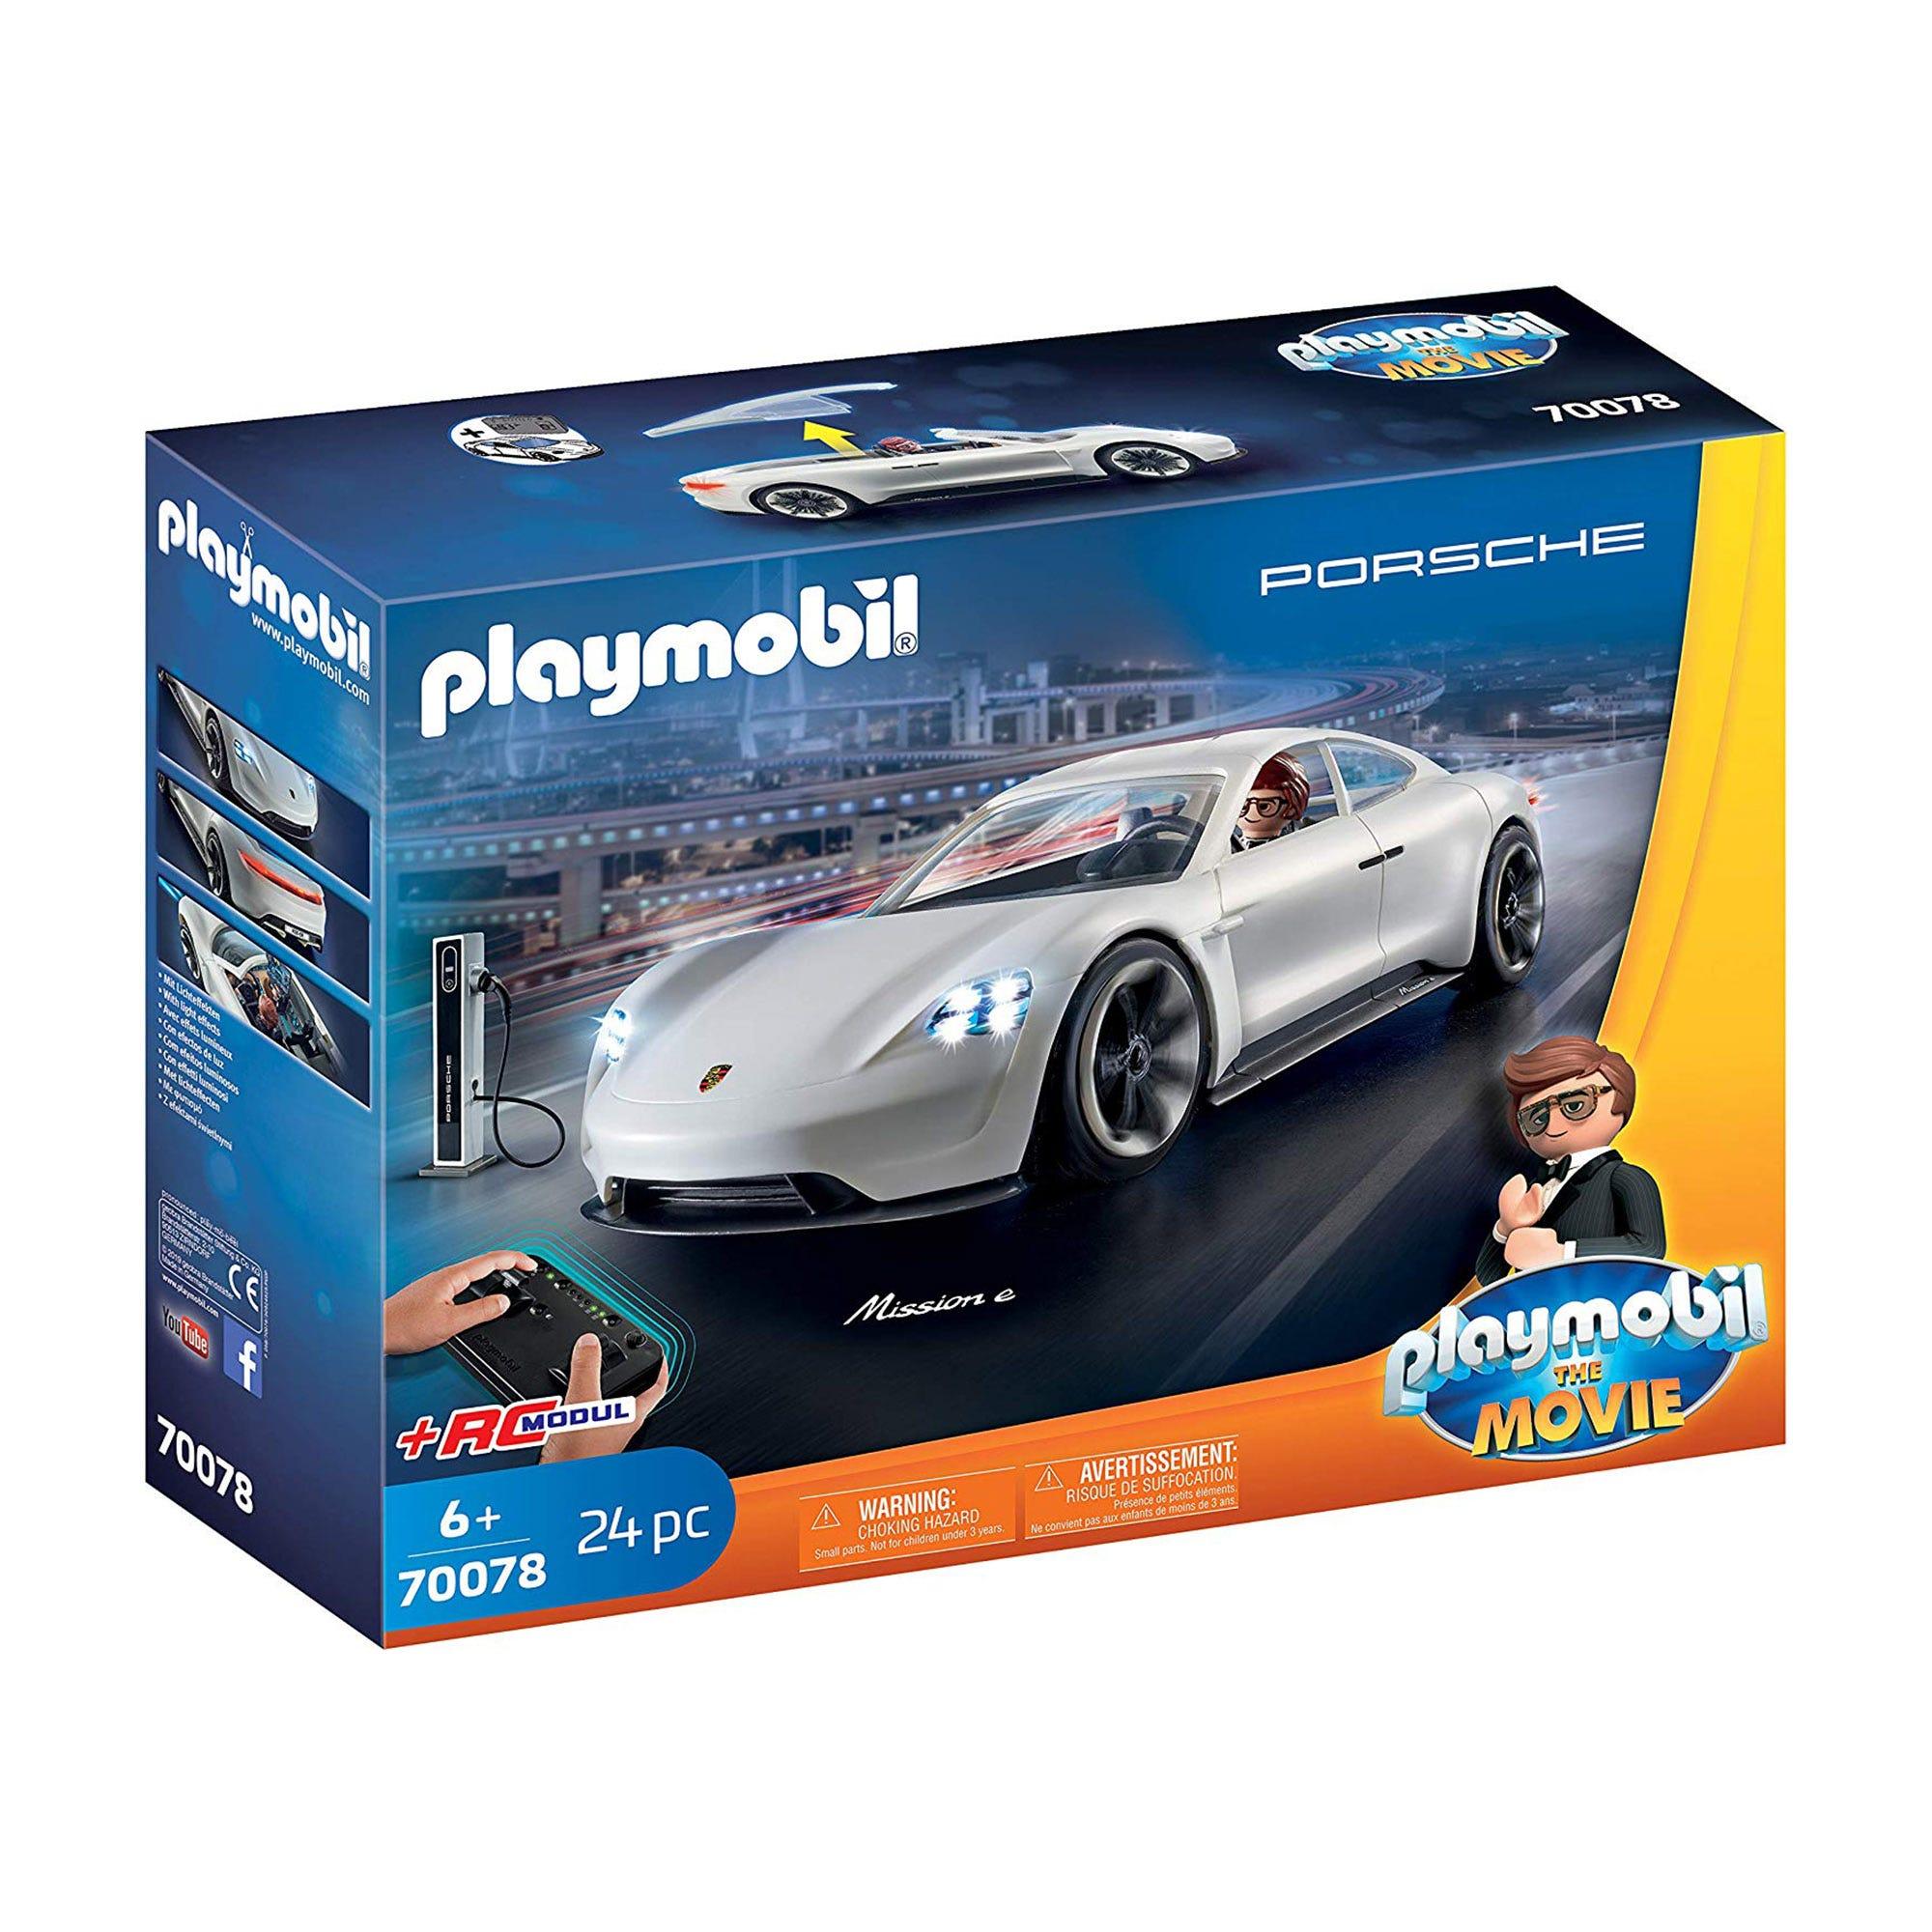 Playmobil 70078 Playmobil: THE MOVIE Rex Dashers Porsche Mi